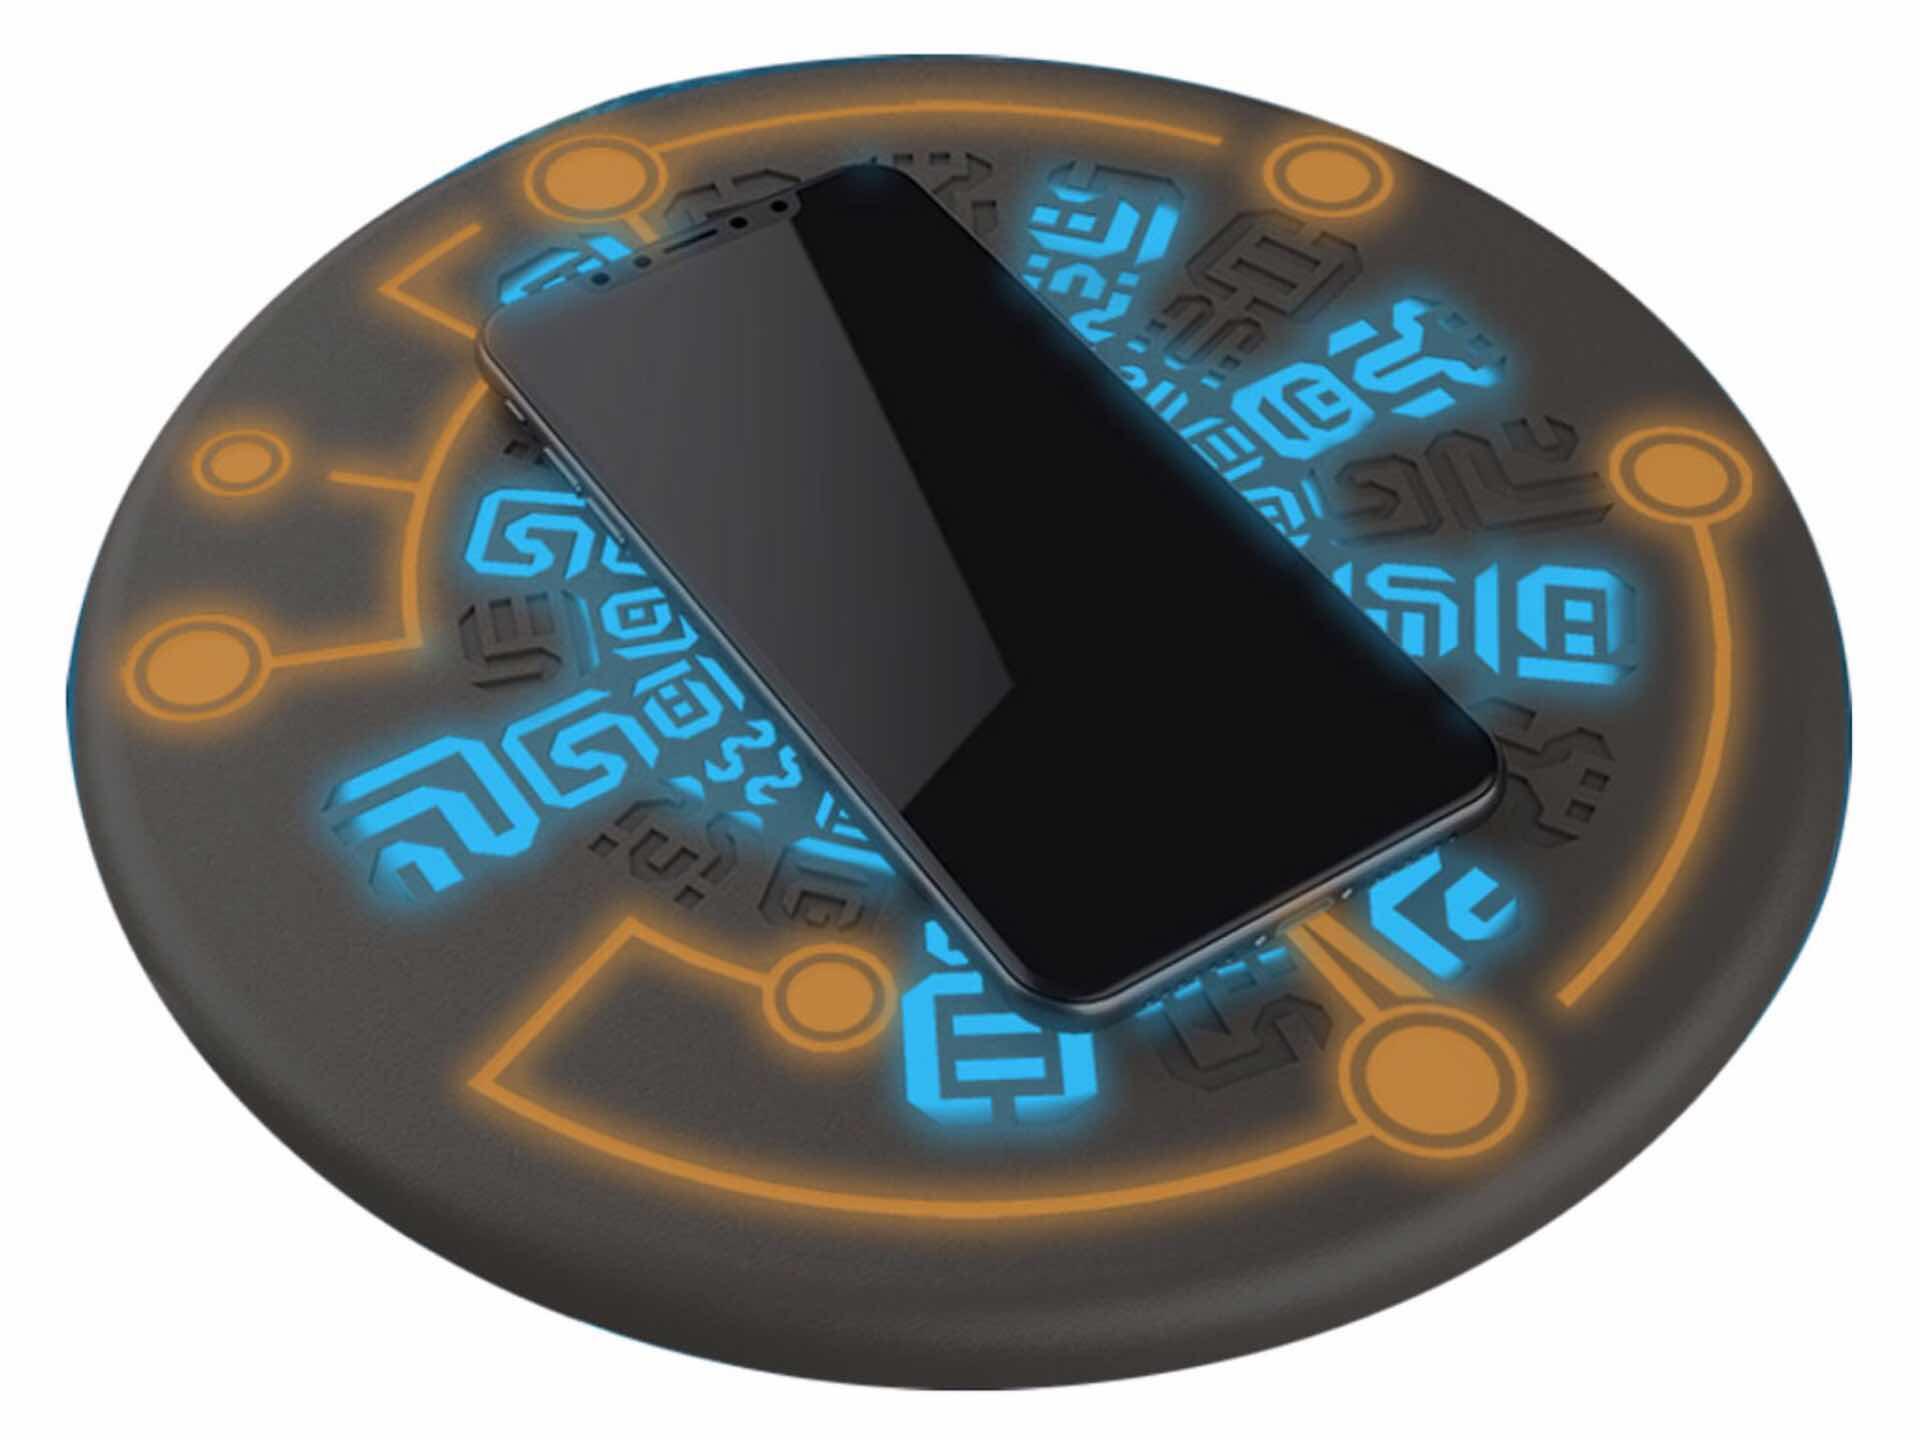 regisbox-sheikah-slate-zelda-themed-wireless-phone-charging-pad